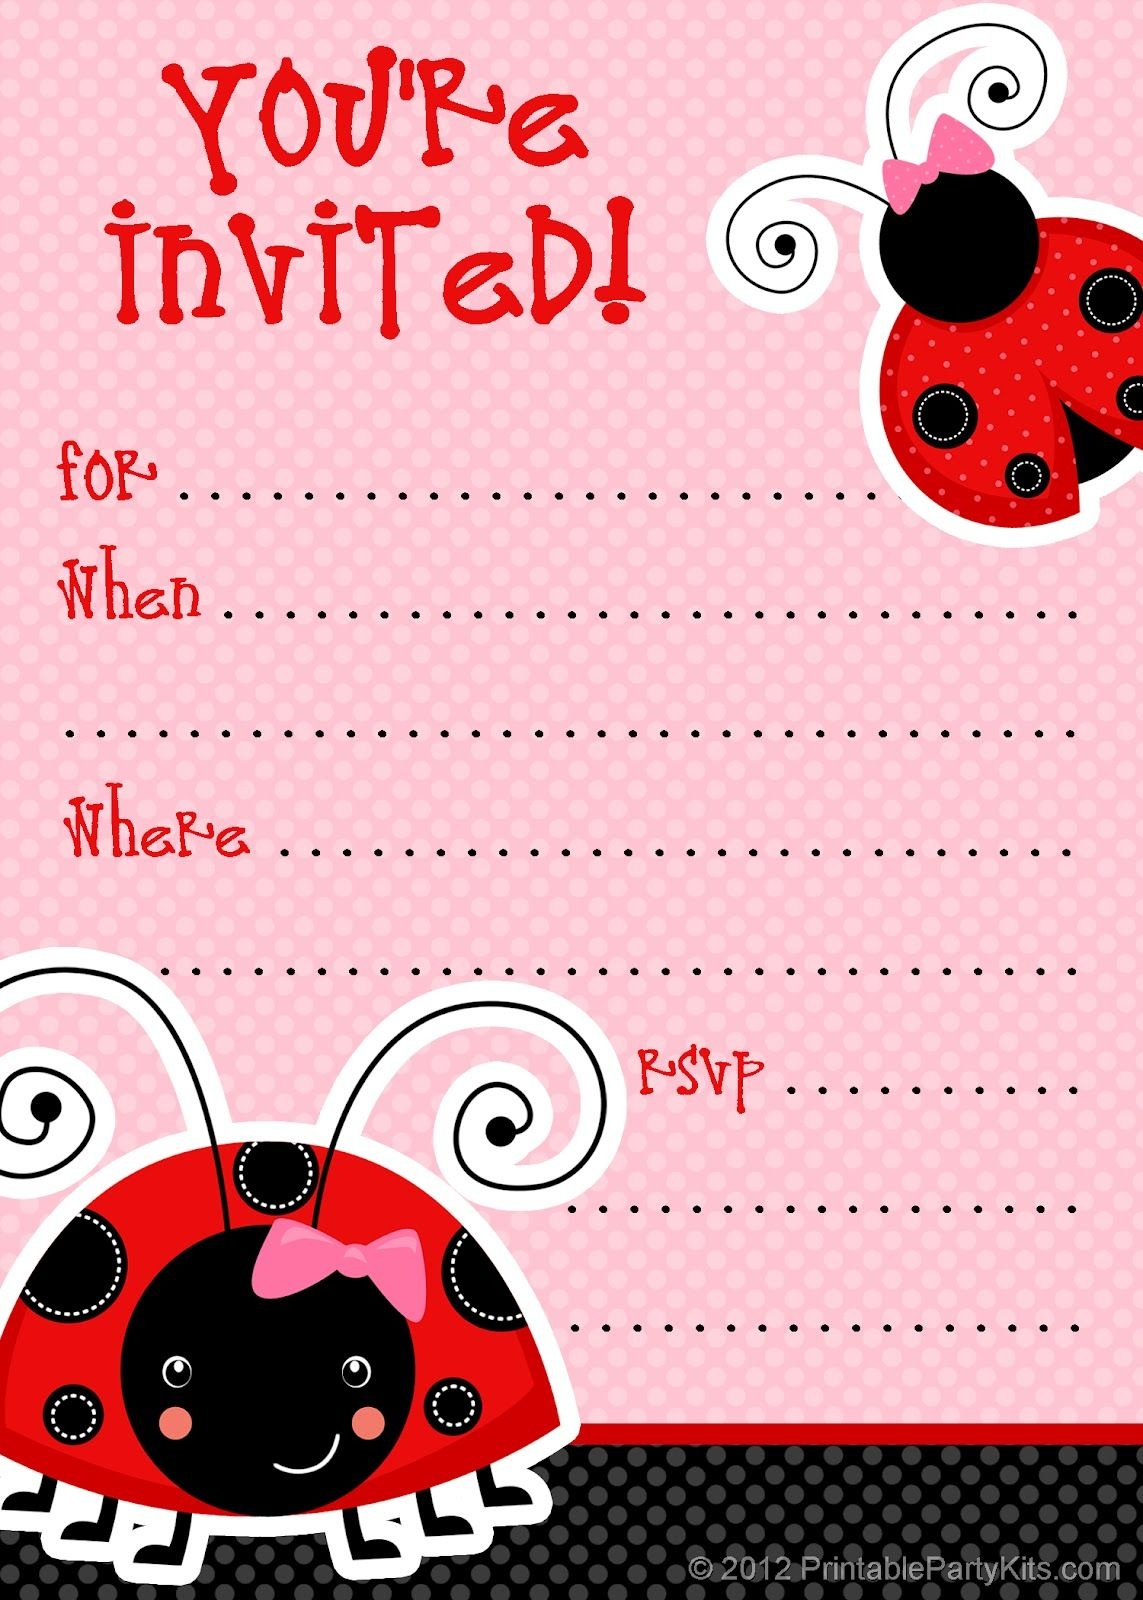 1) Free Printable Ladybug Invitation Blank Template. 2) Beautiful - Ladybug Themed Birthday Party With Free Printables